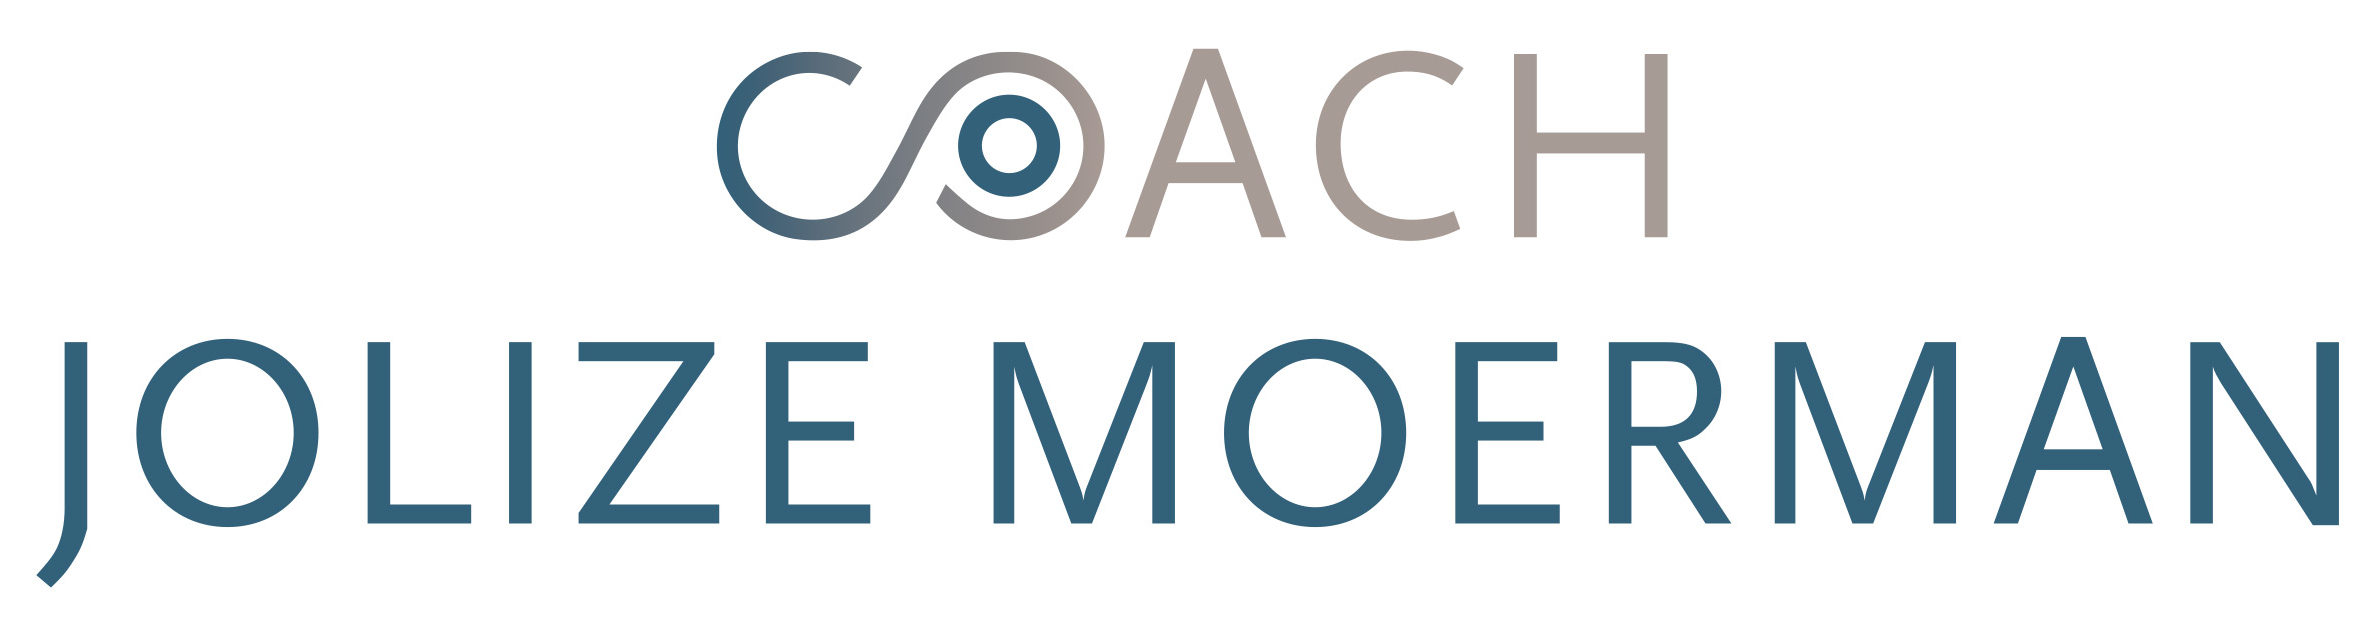 Jolize Moerman Coach Oostvoorne logo